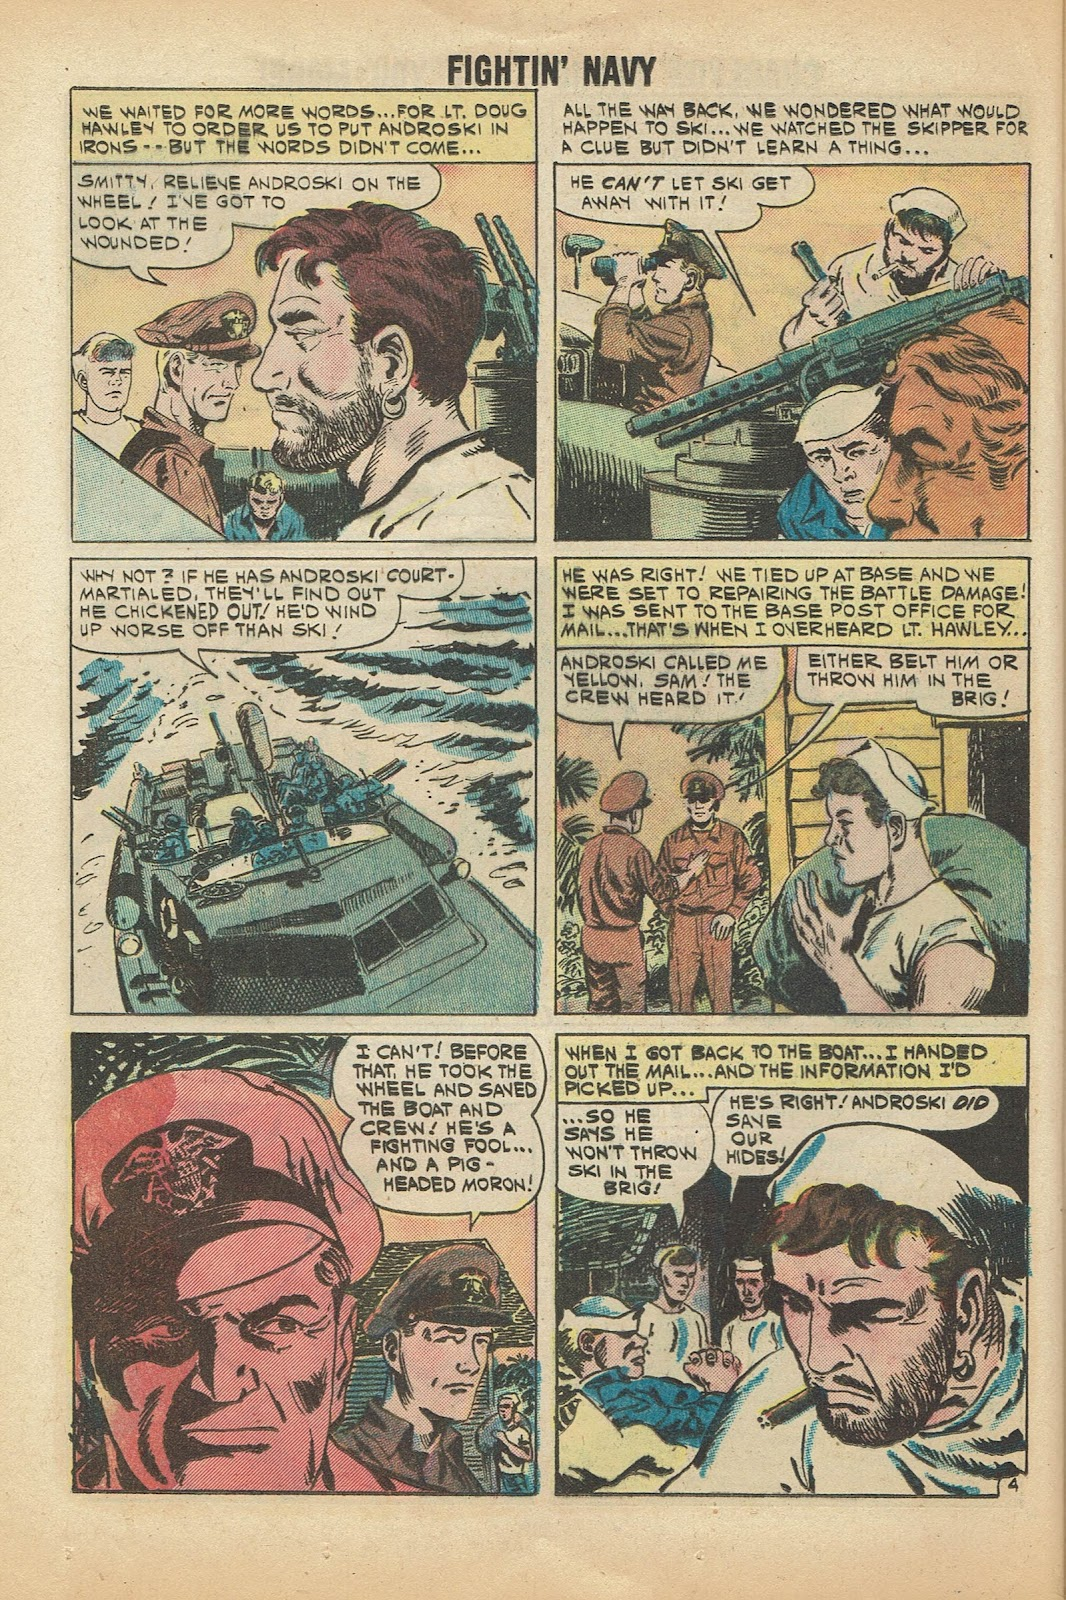 Read online Fightin' Navy comic -  Issue #97 - 24